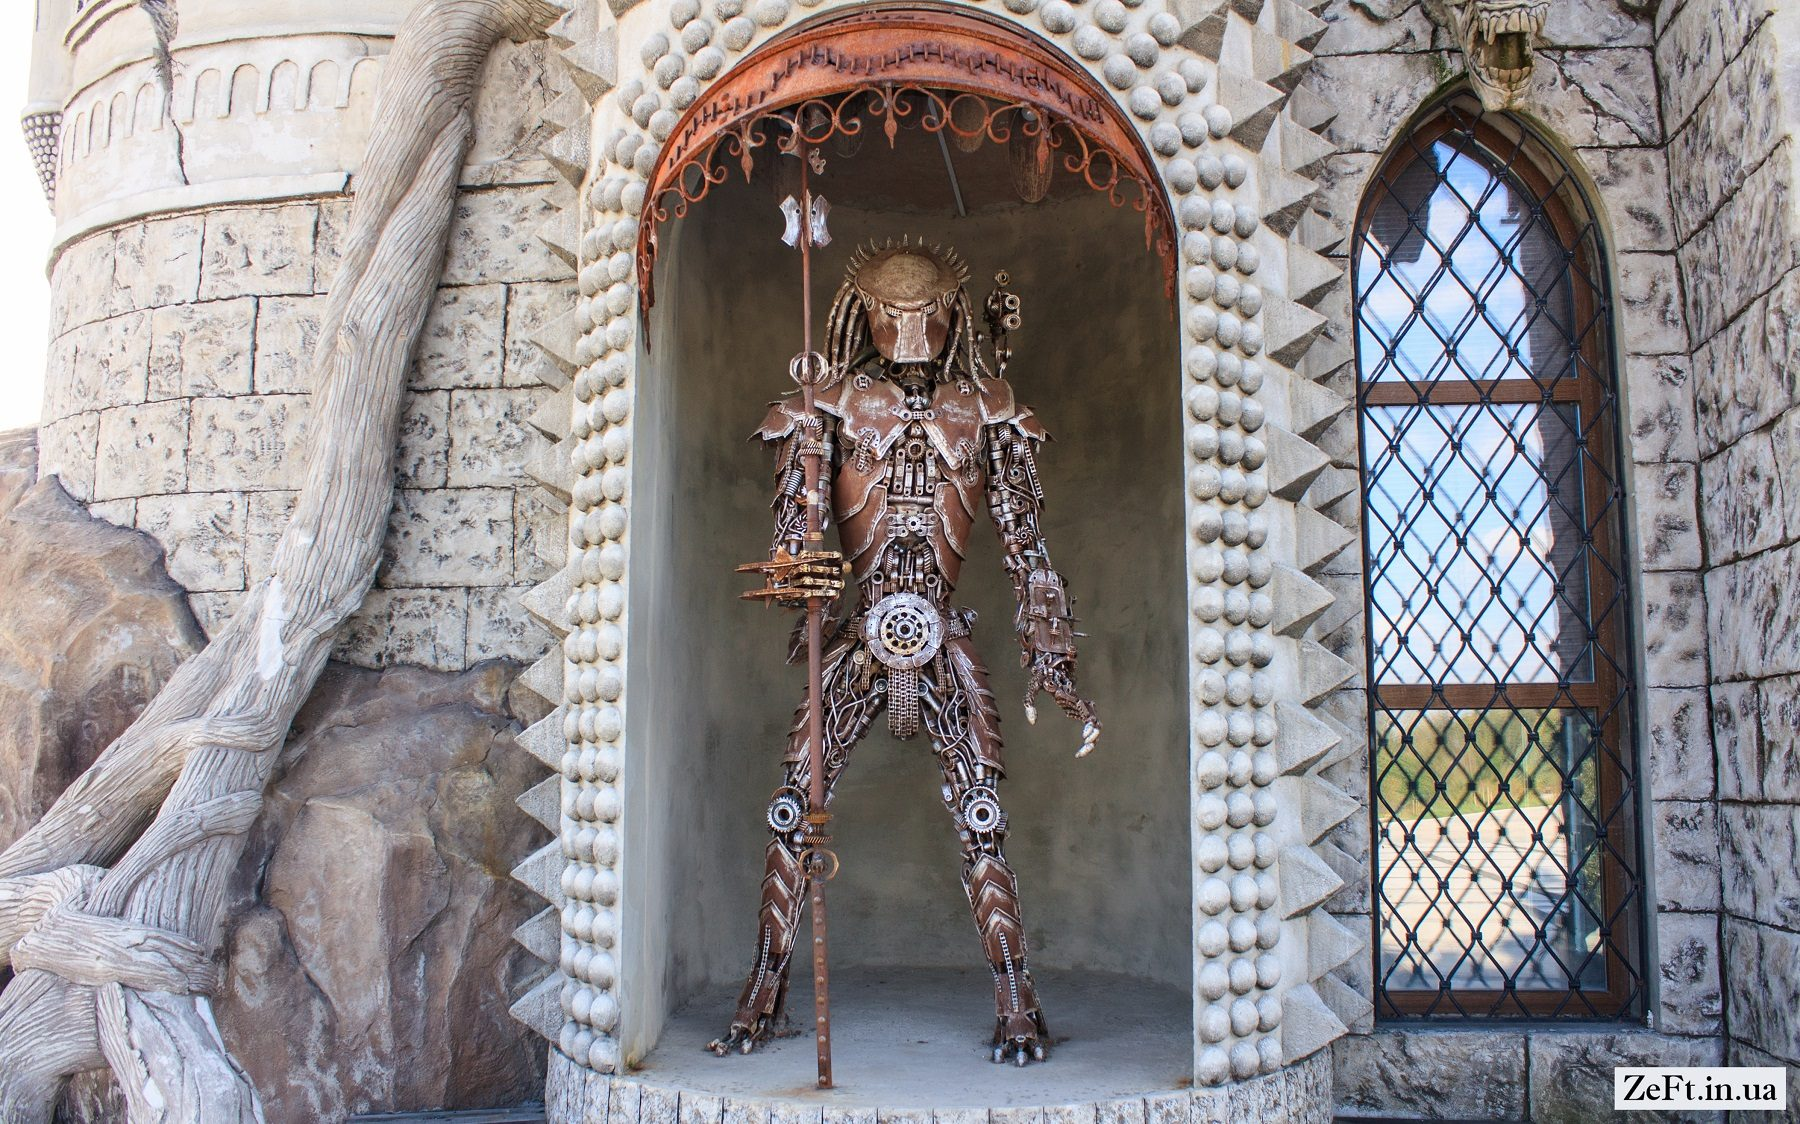 Казковий замок на Київщині -  - Disneyivskij zamok vid kinostudiyi Victoria Film Studios s.Gurivshhina 6 1800x1124